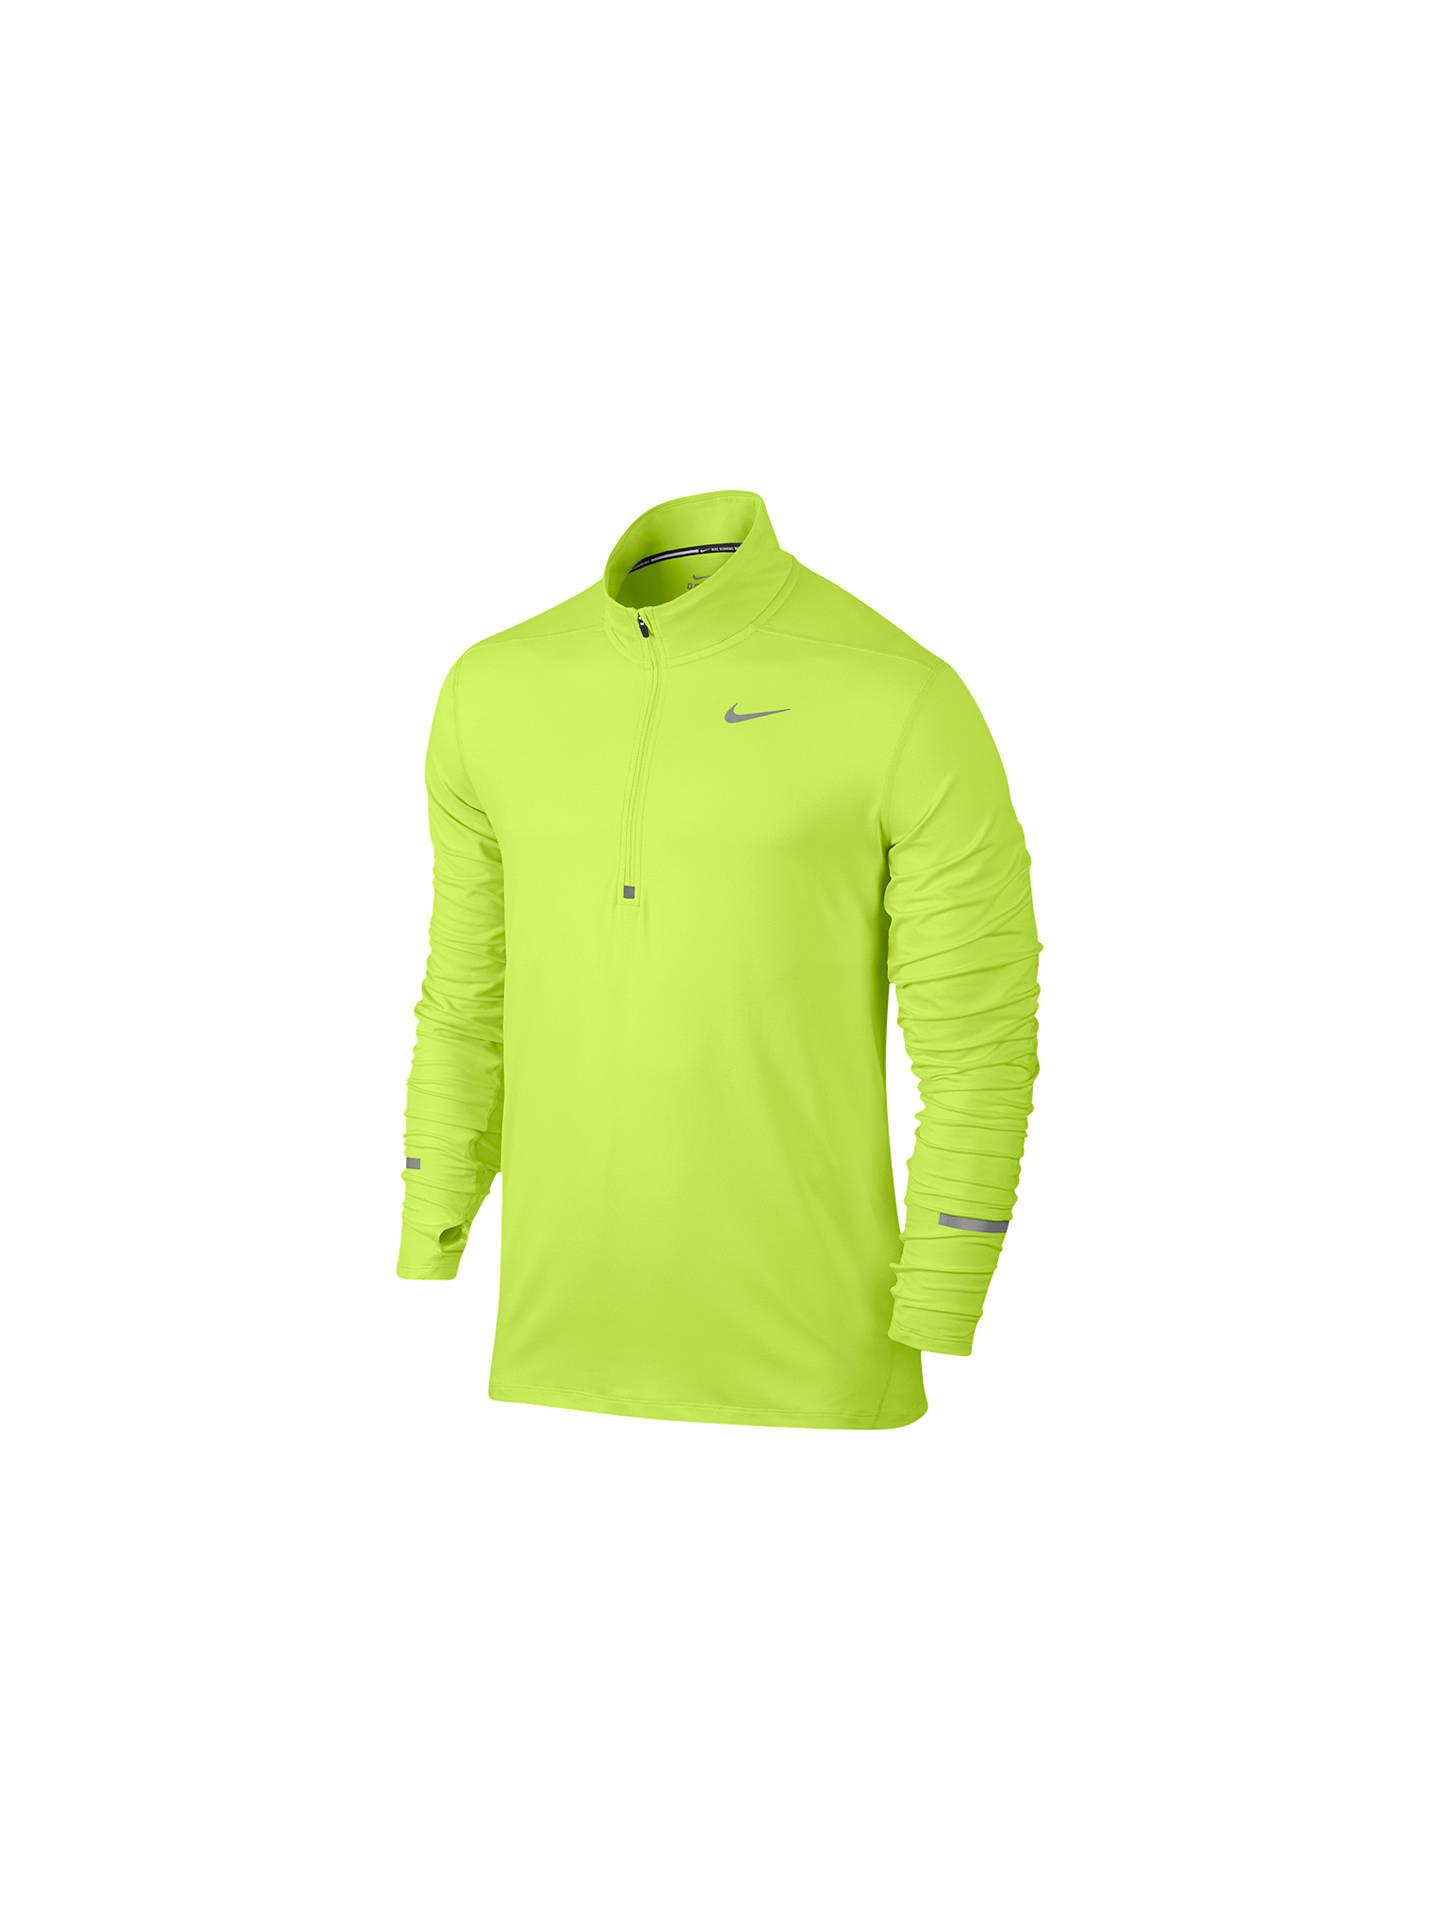 68e4e5d93989f Nike Dri-FIT Element Half-Zip Long Sleeve Running Top, Volt at John ...